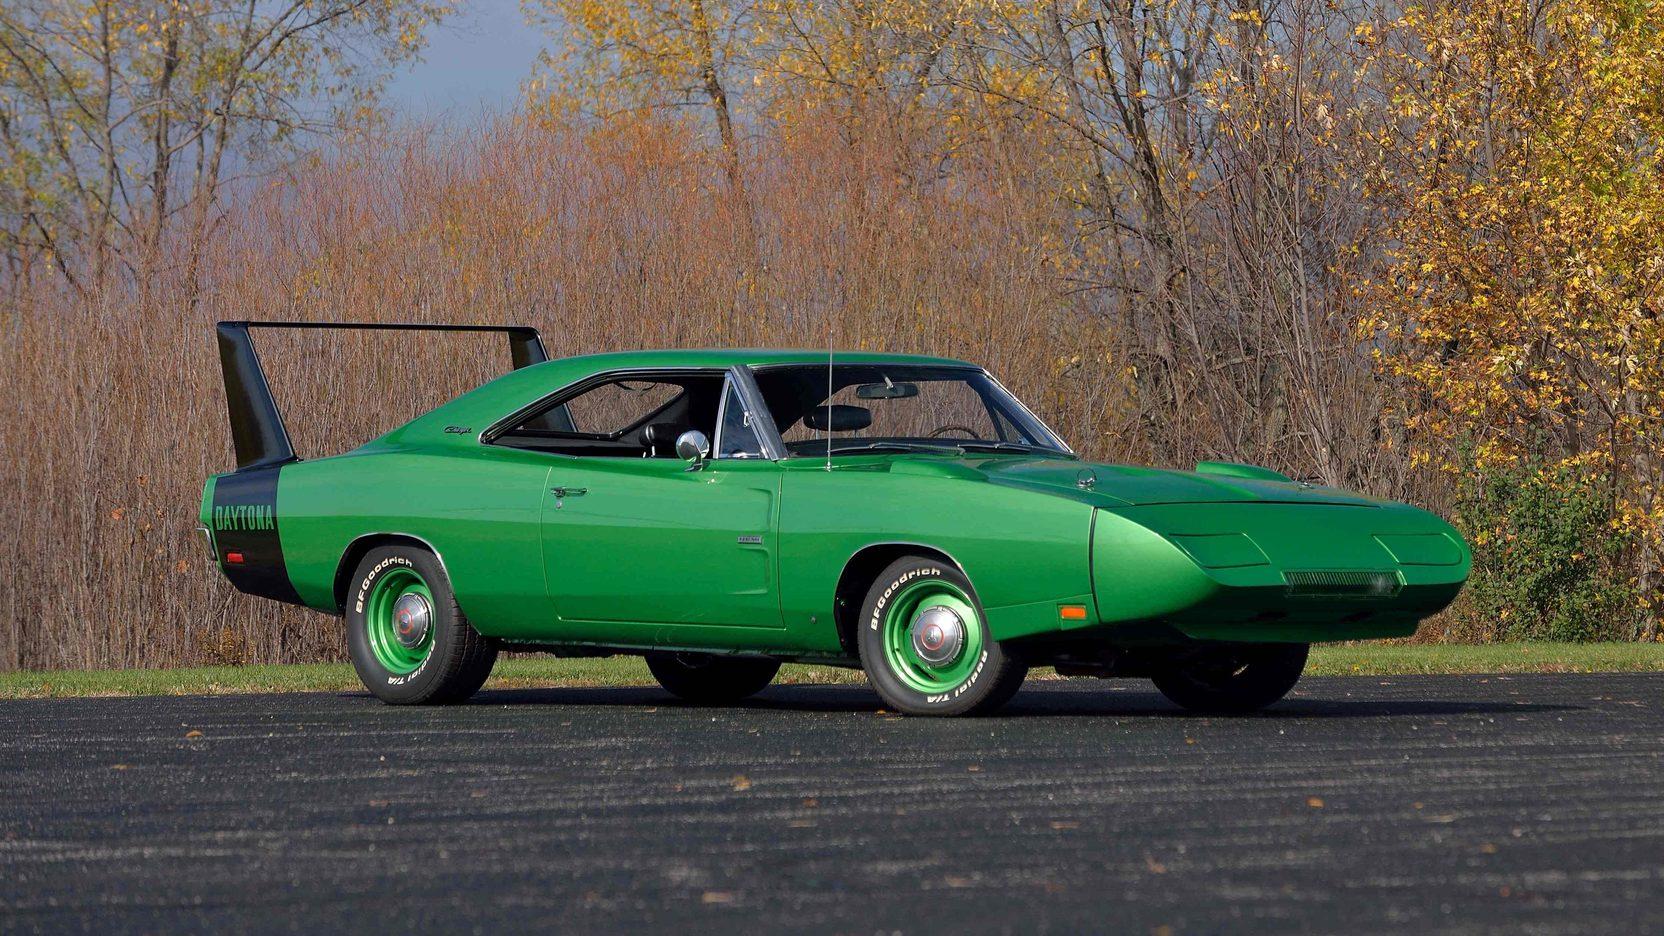 Dodge Daytona Vs. Plymouth Superbird: What You Need To